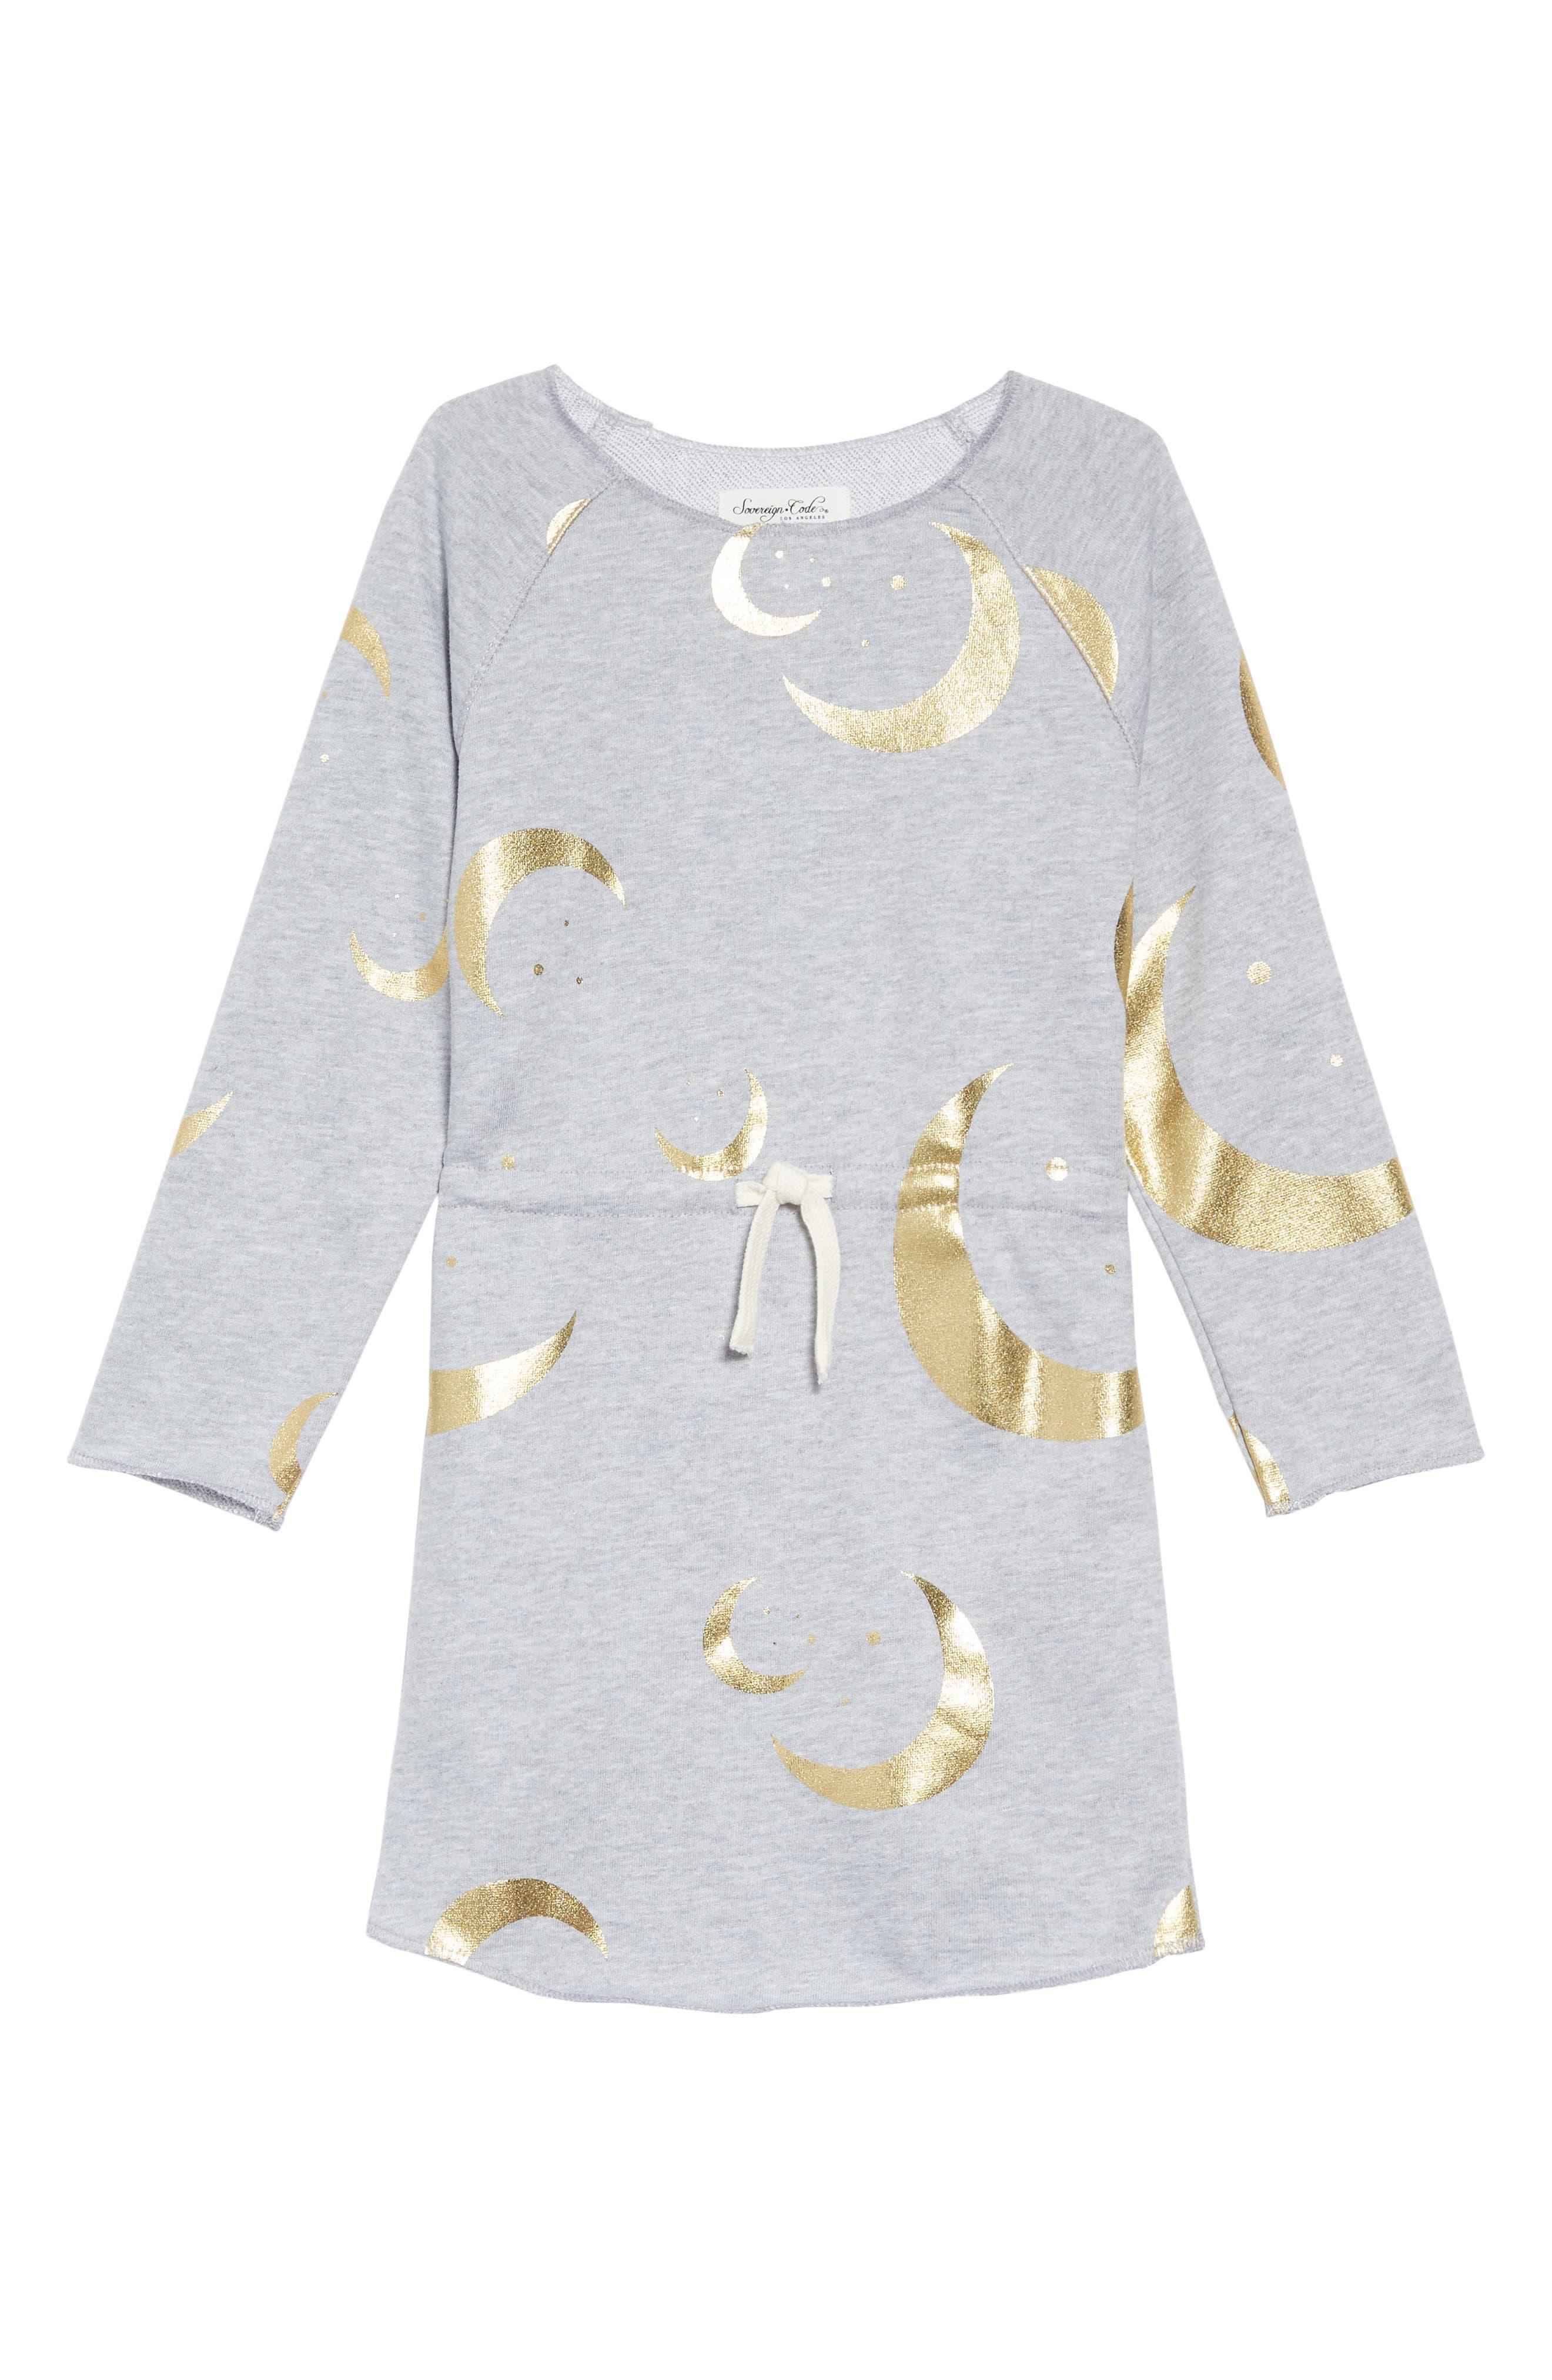 Danica Print Sweatshirt Dress,                             Main thumbnail 1, color,                             HALF MOON/HEATHER GREY